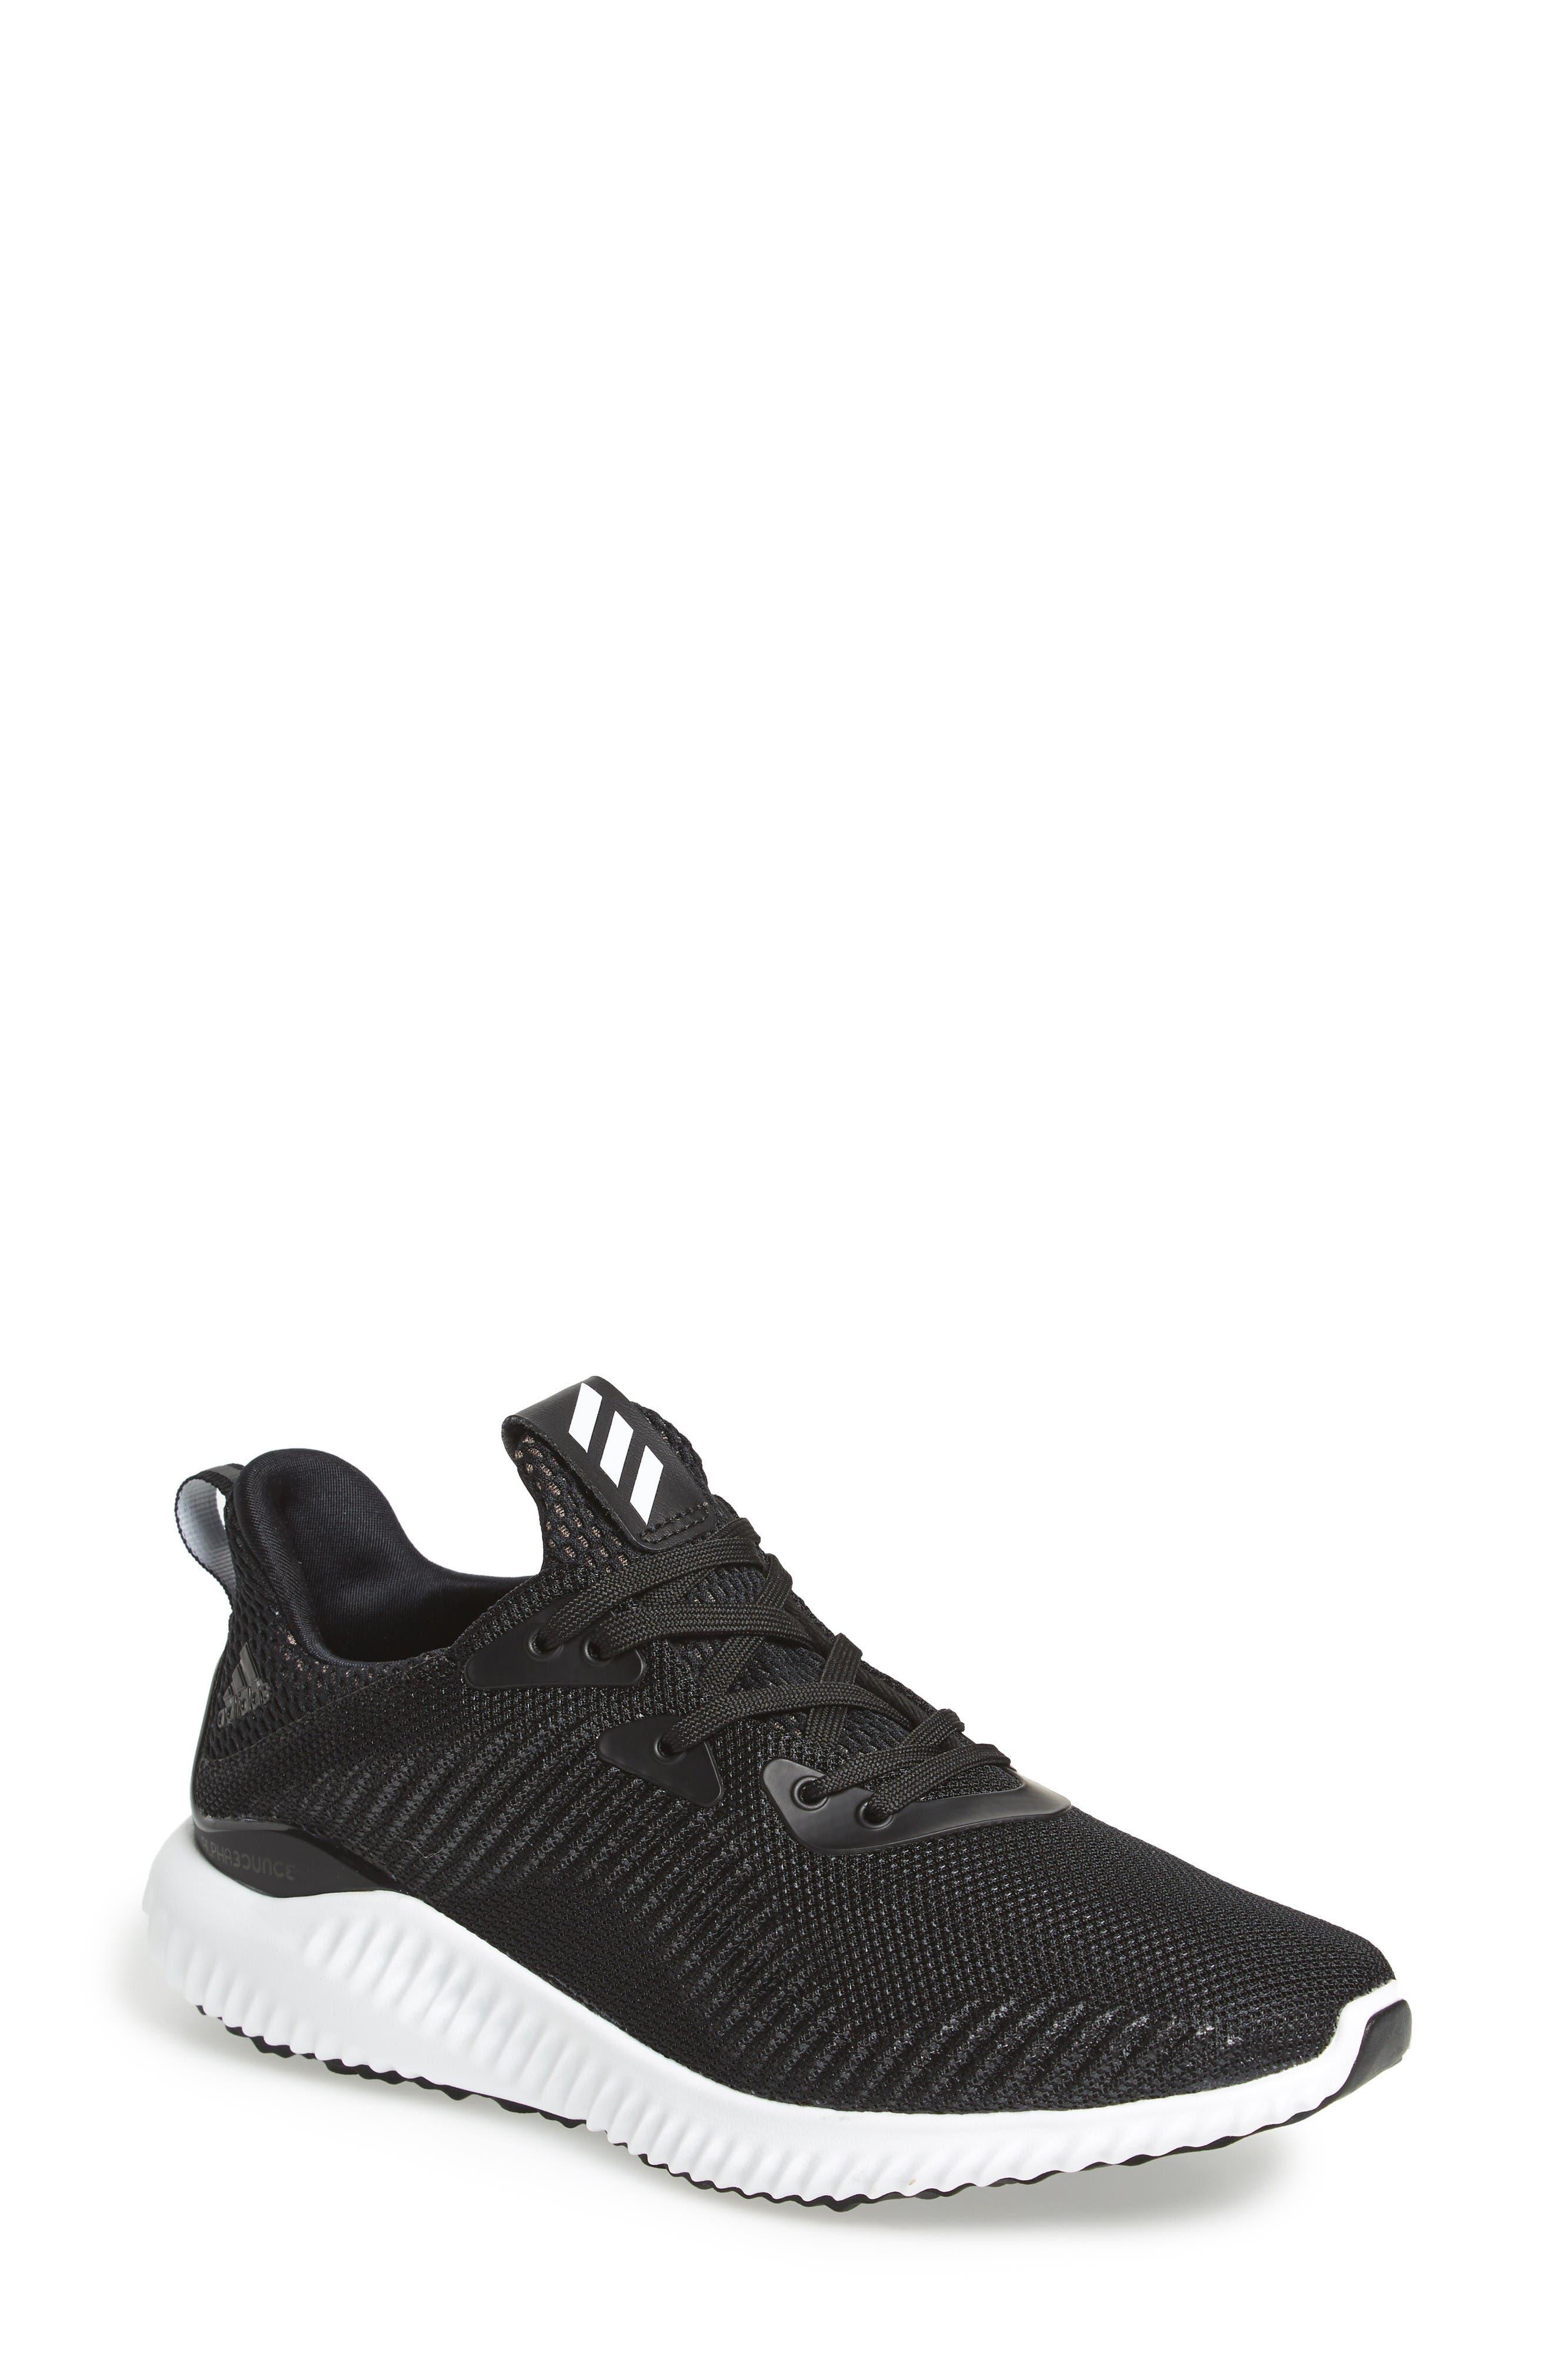 867bbe176 Adidas Alphabounce Slides Ebay Women Sneakers Sale Adidas ...